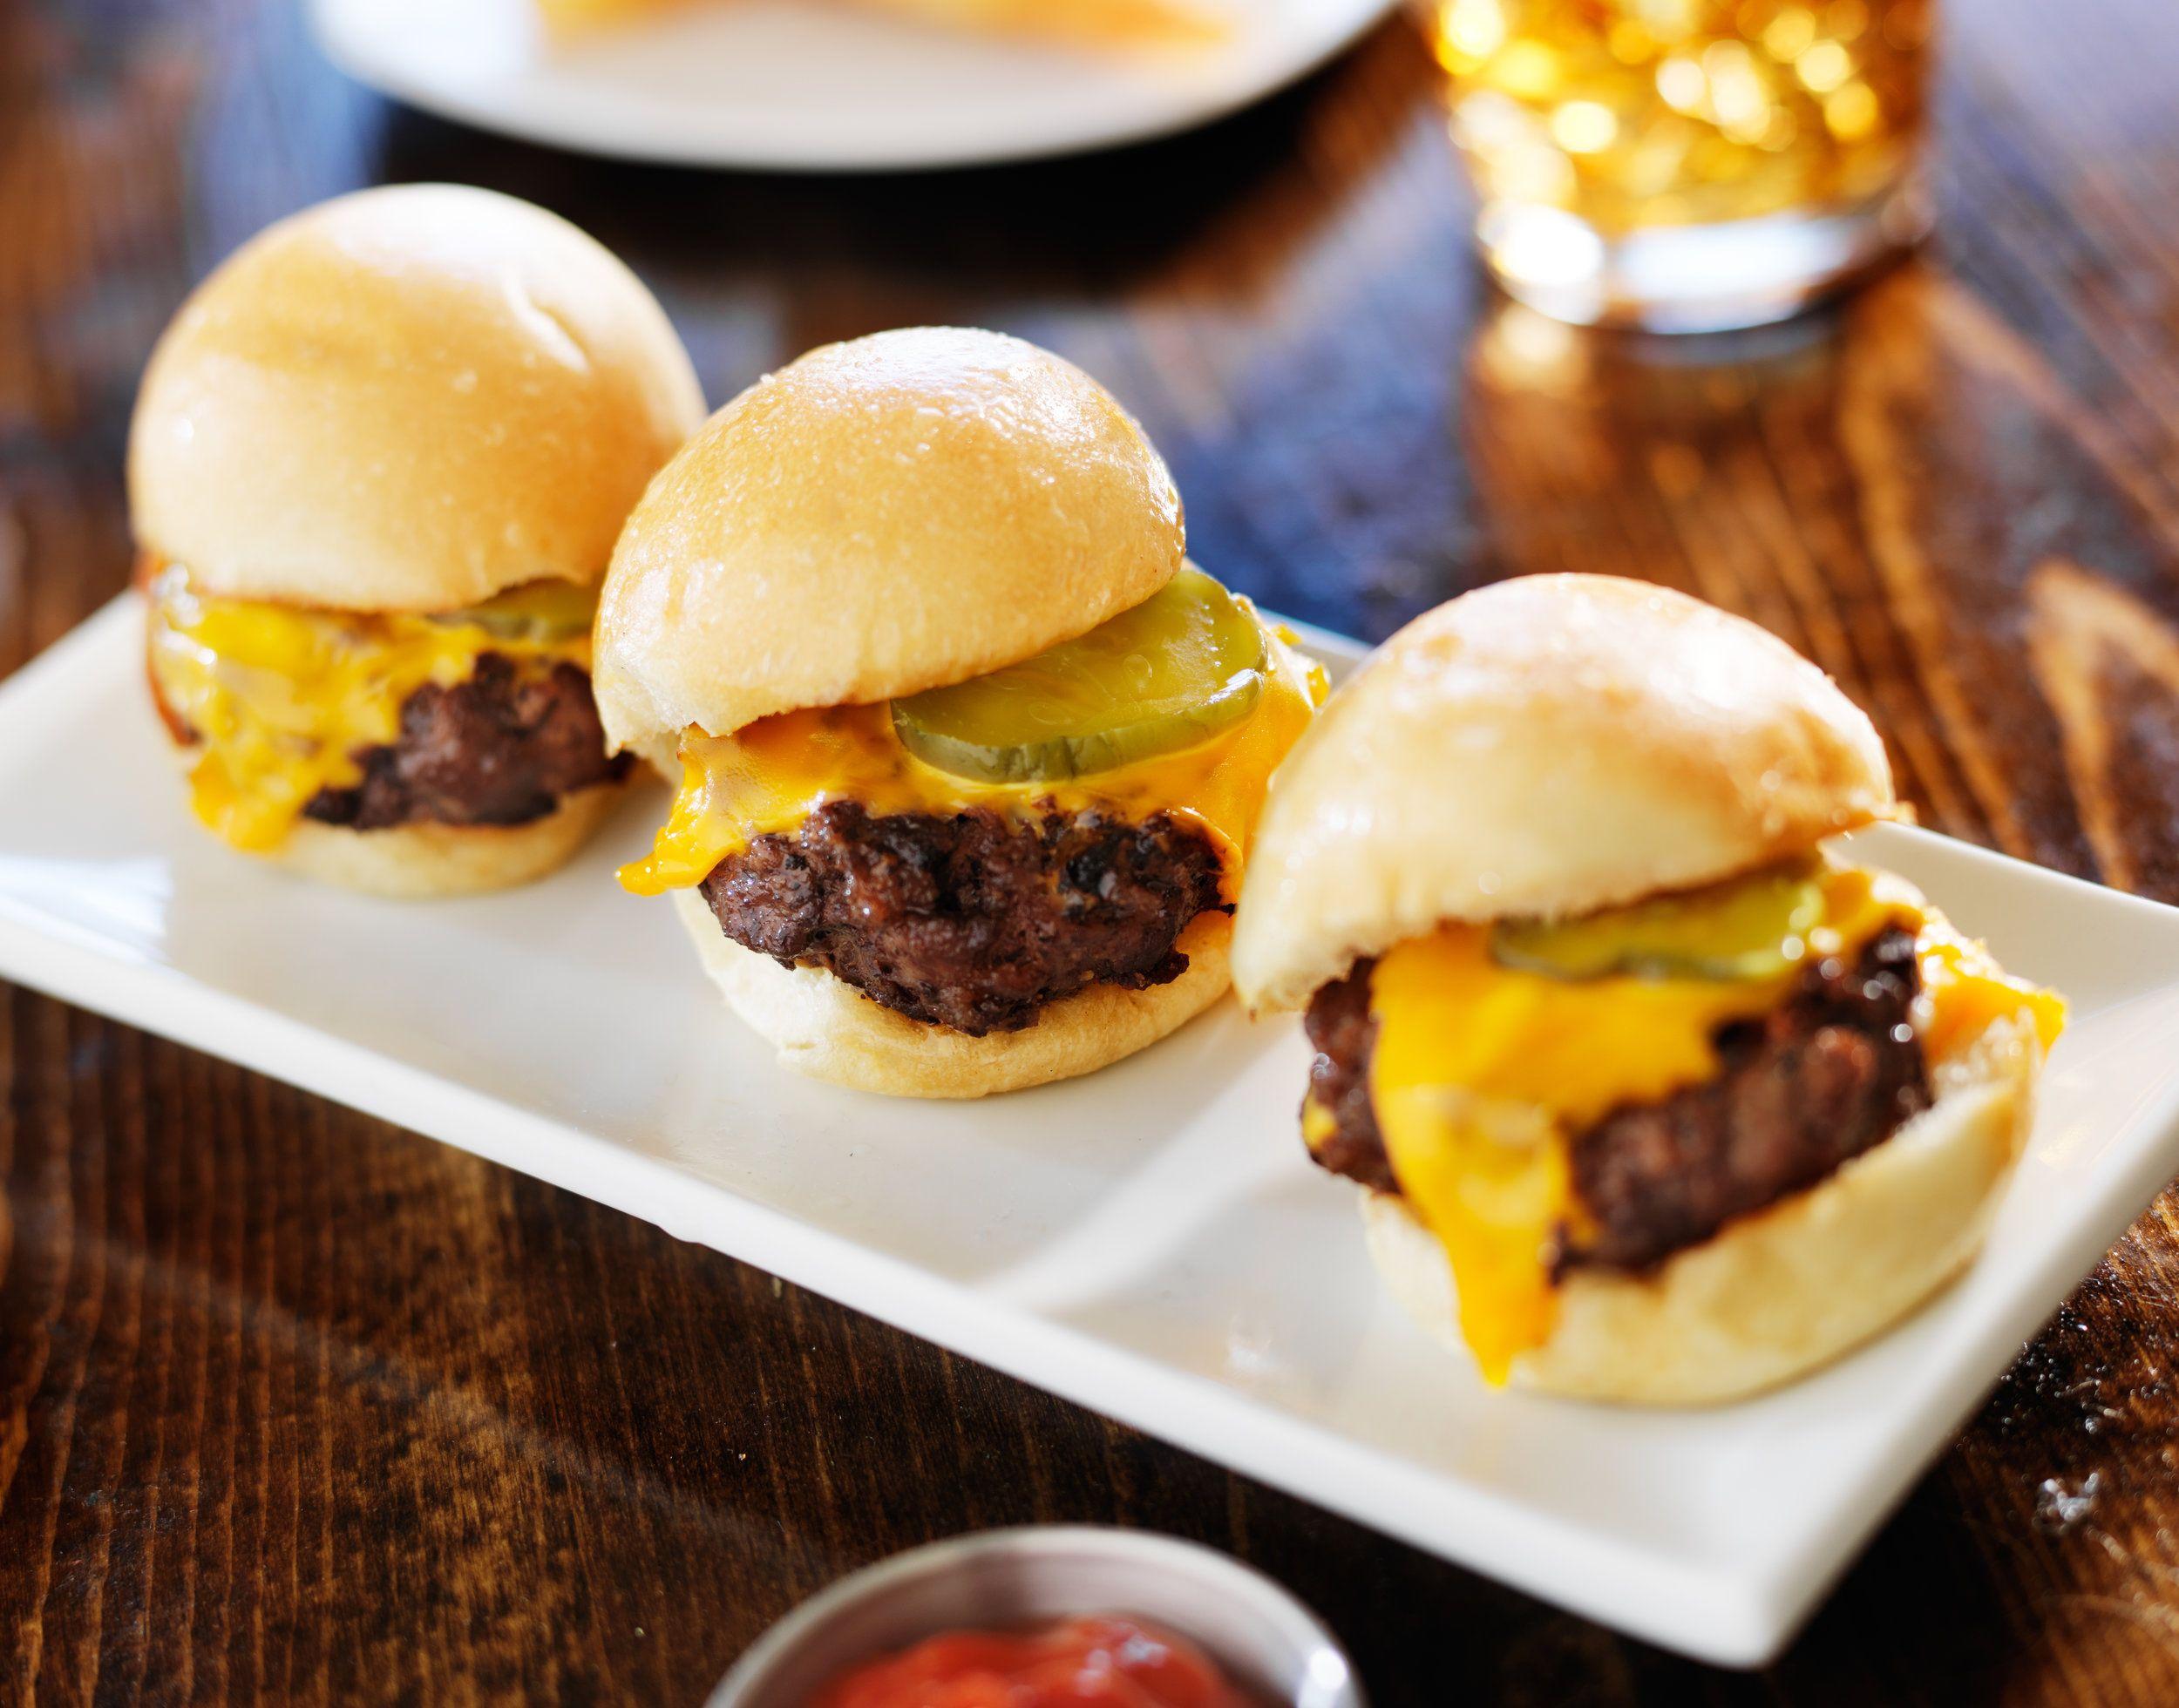 Cheeseburger Sliders (With images) Recipes, Cheeseburger